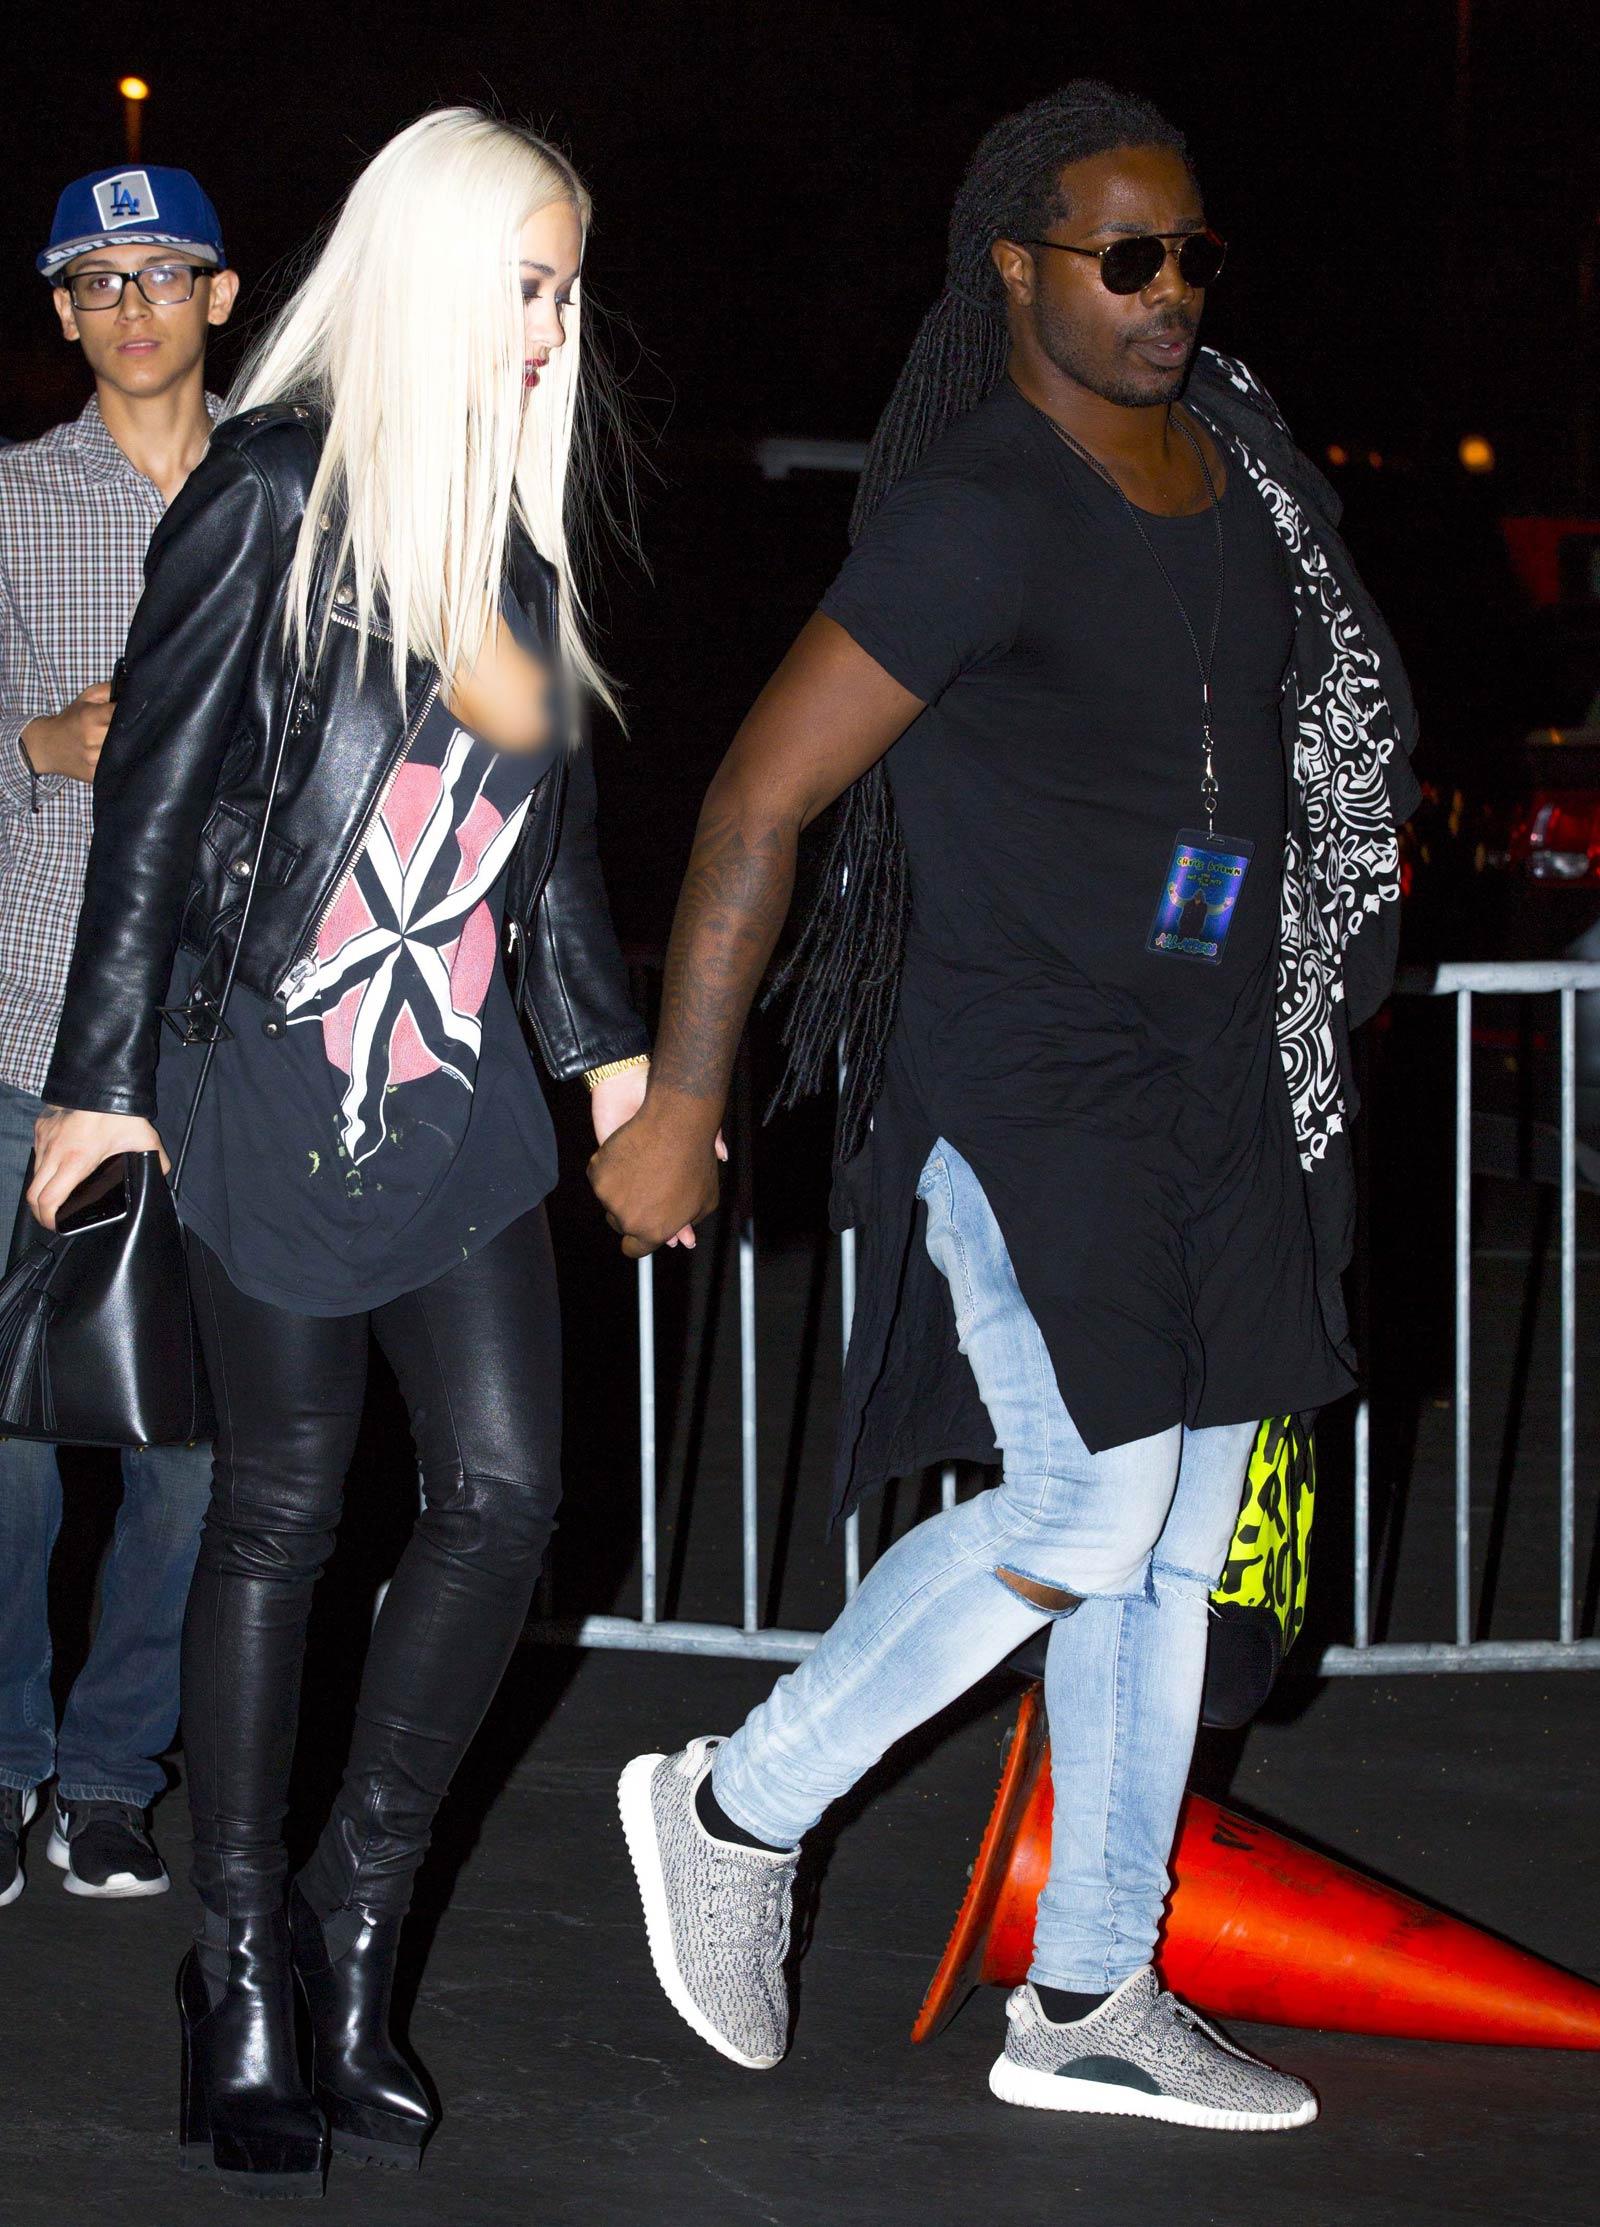 Rita Ora leaving a Chris Brown concert